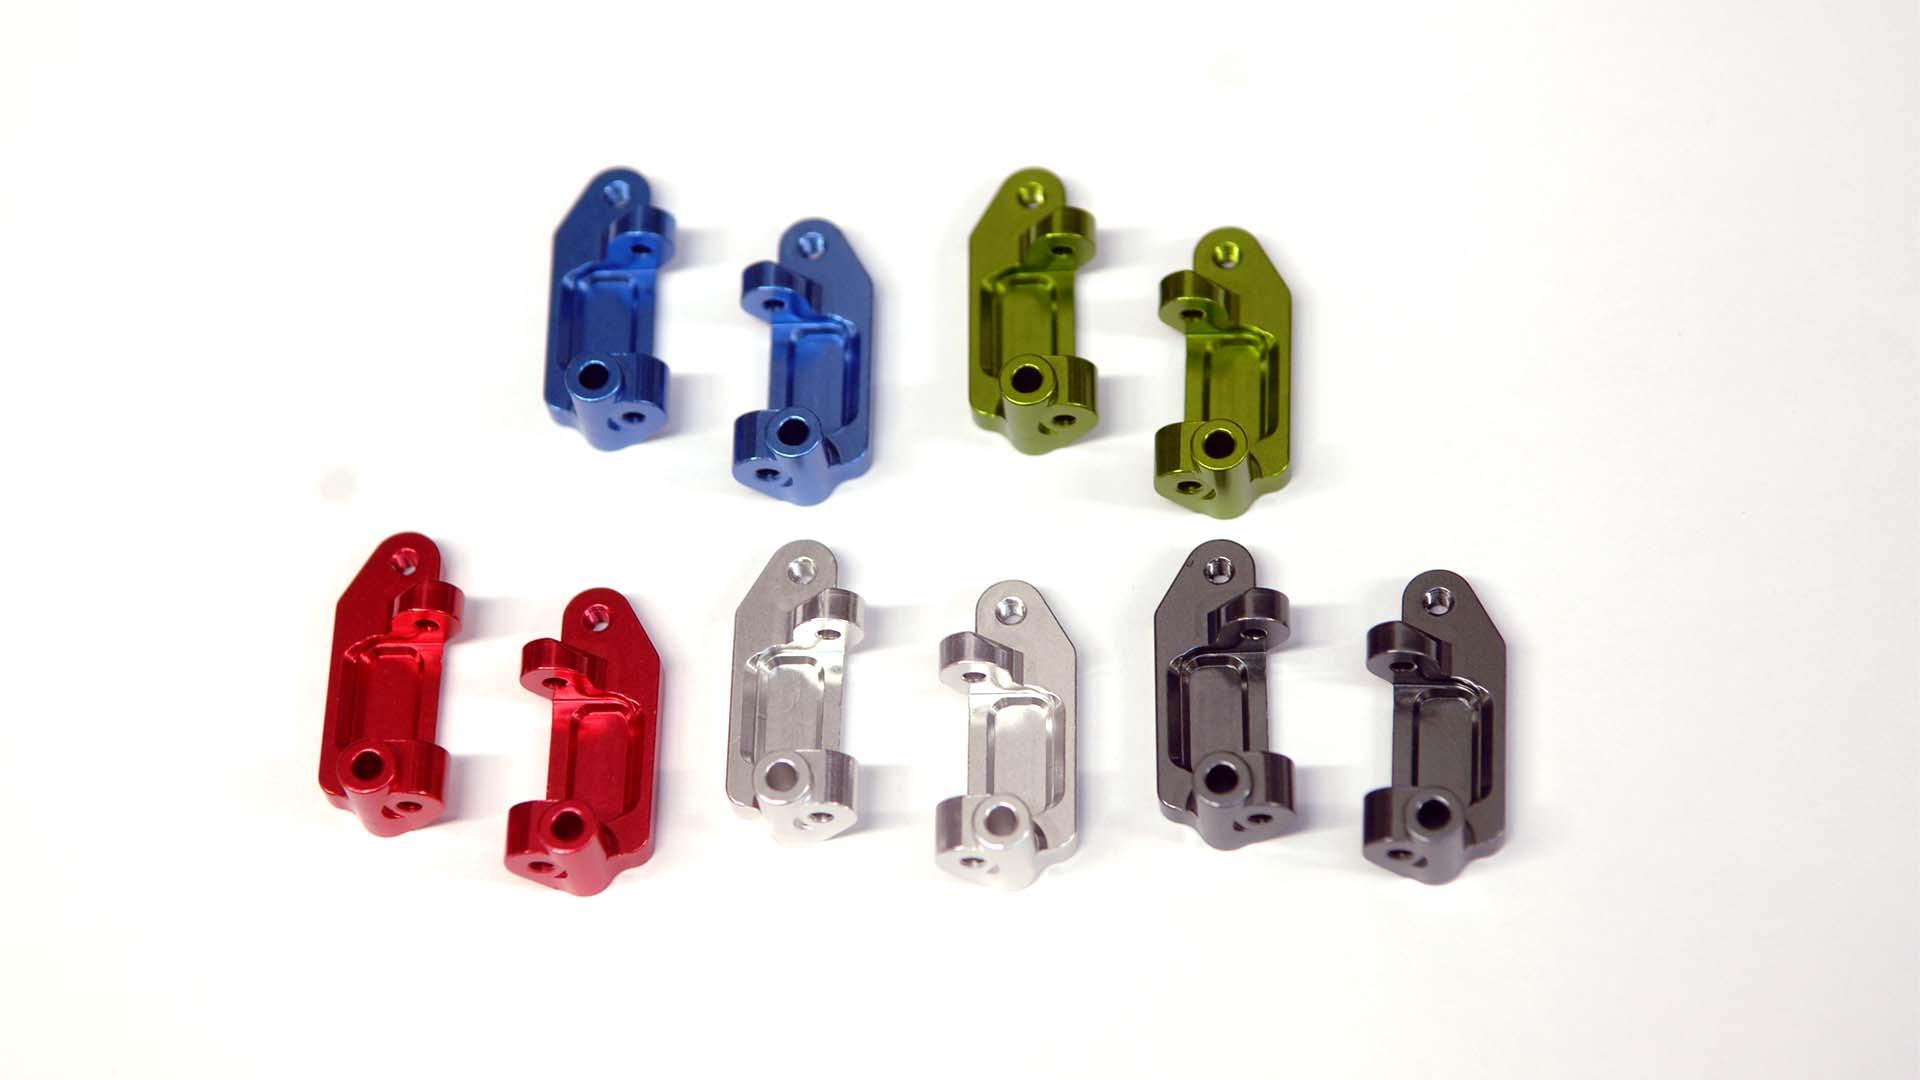 STRC Aluminum Option Parts For Traxxas Drag Slash